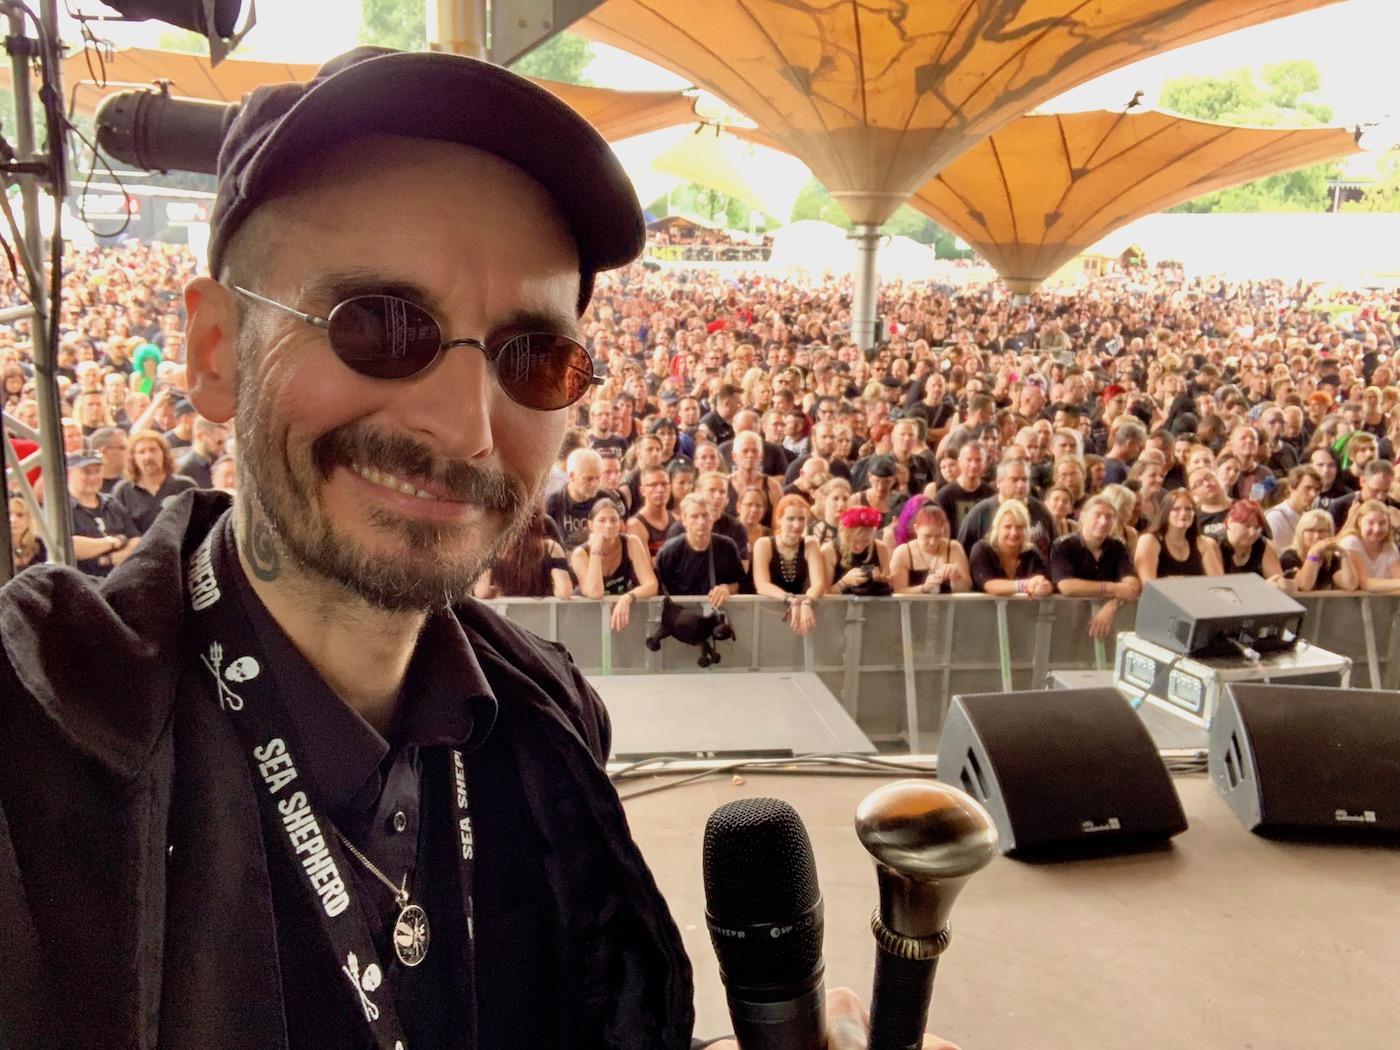 mark_benecke_amphi_festival_koeln_2019 - 37.jpg